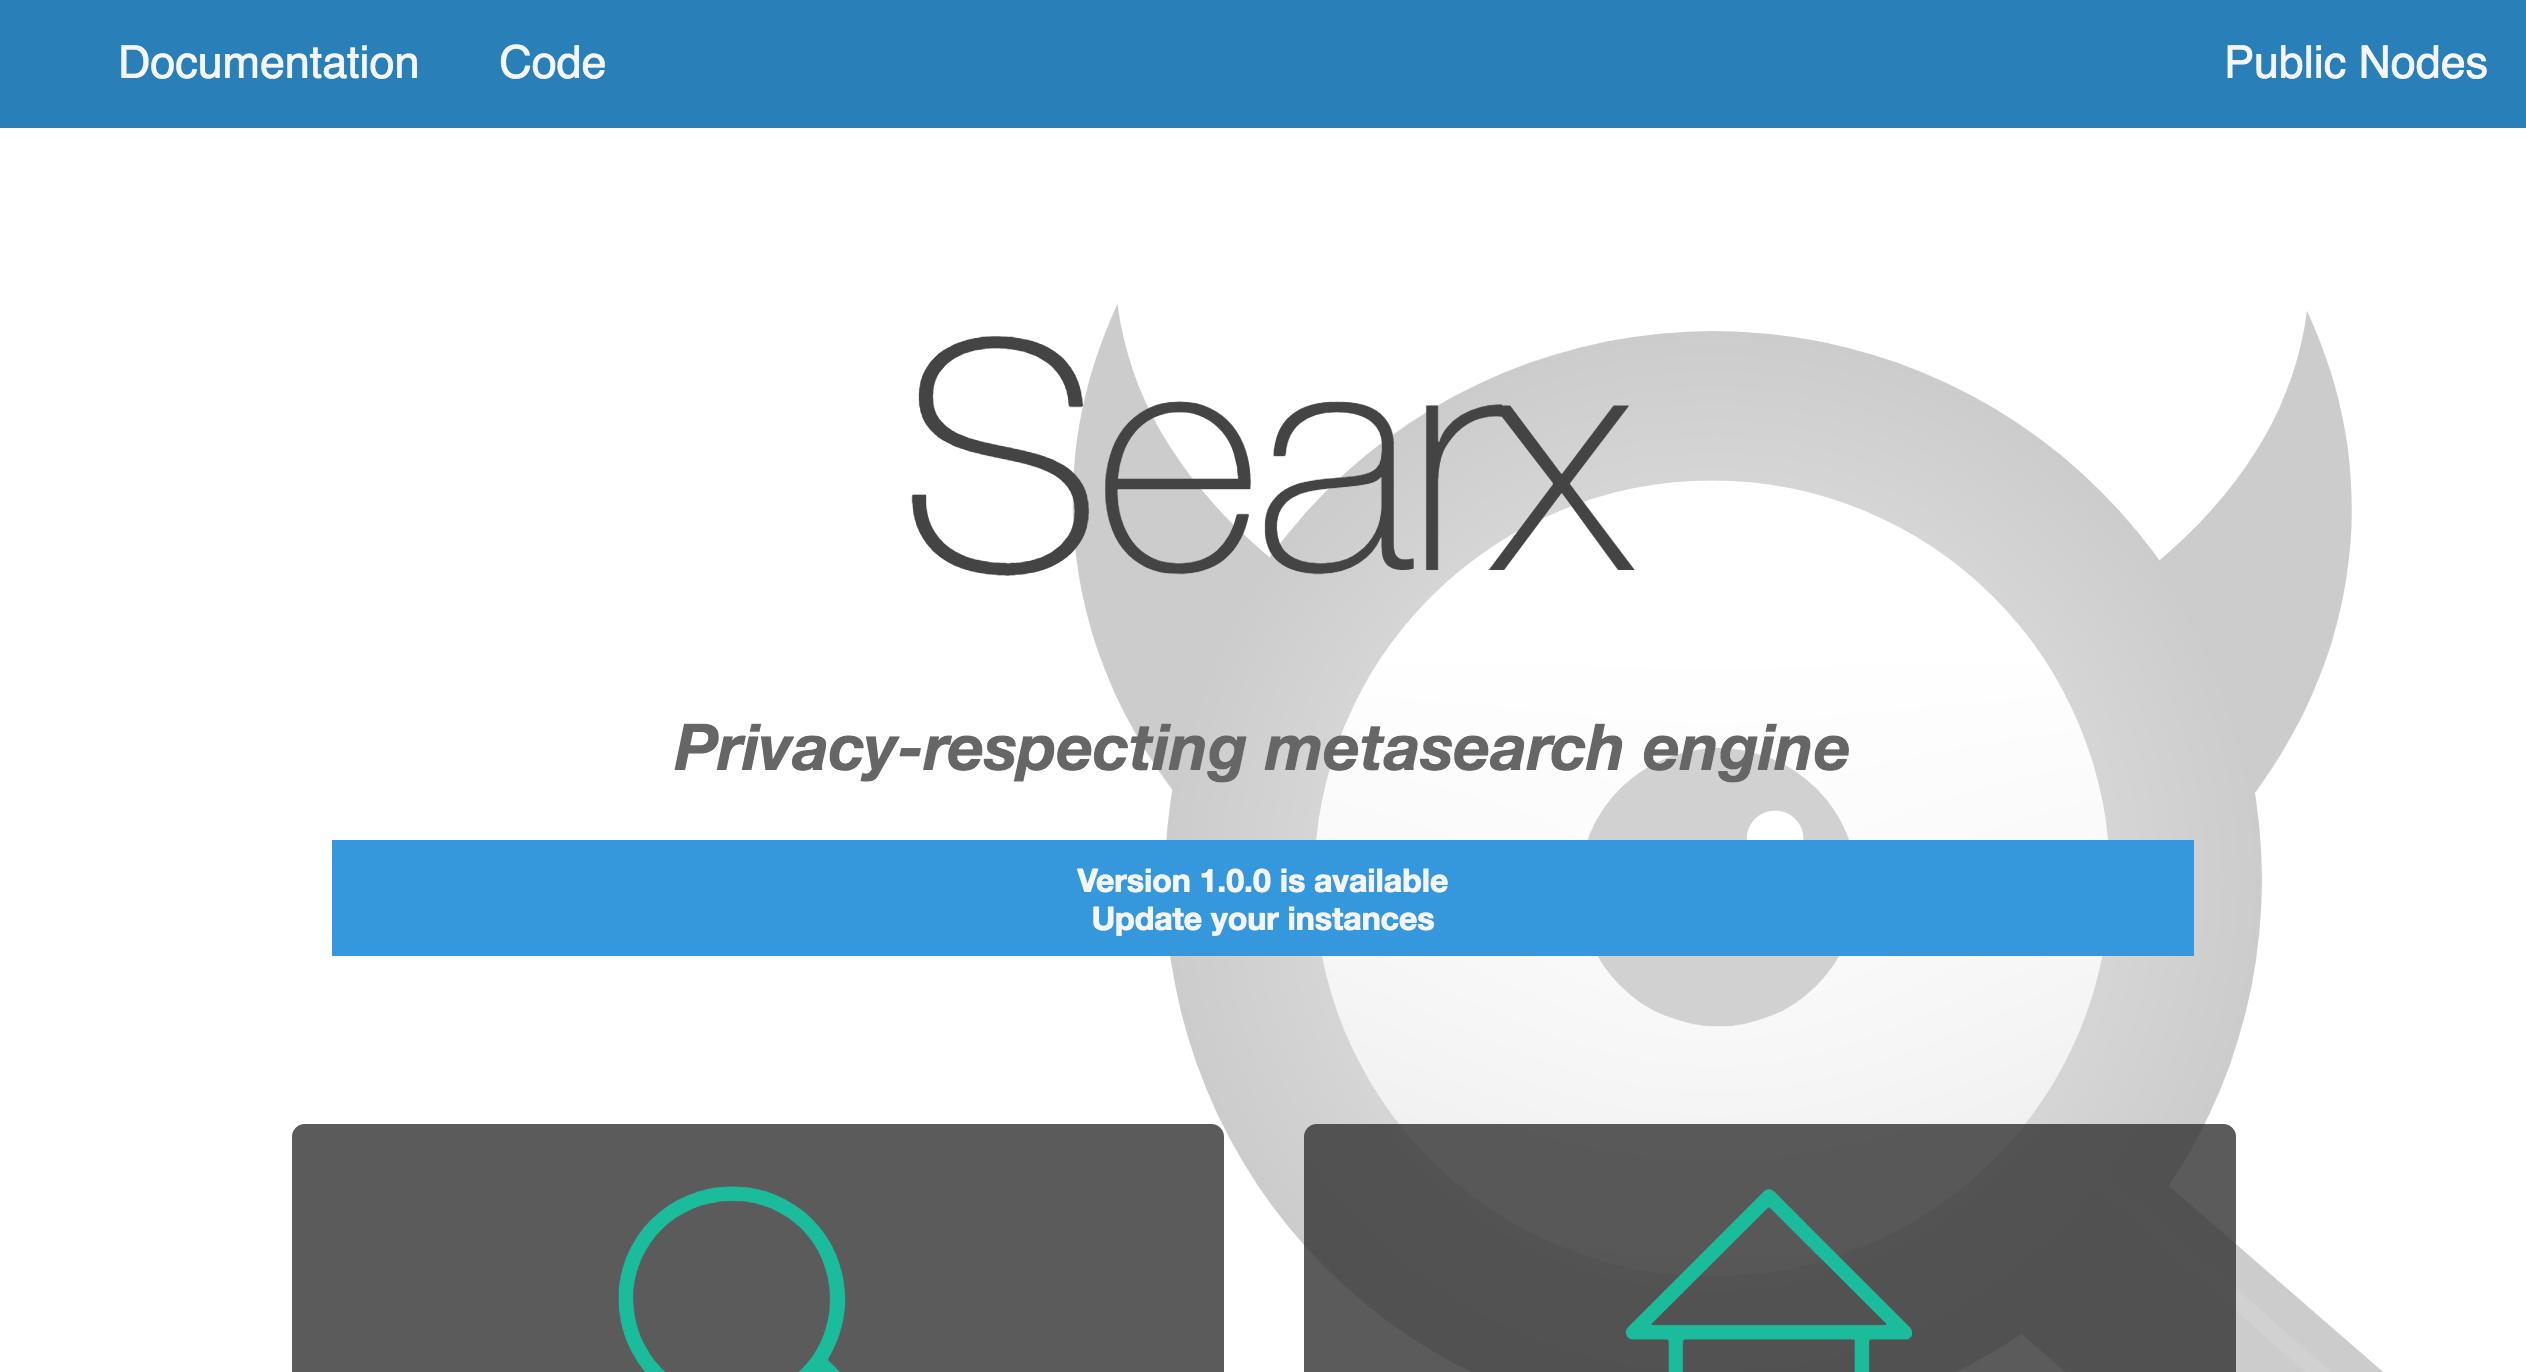 SearX metamoteur de recherche